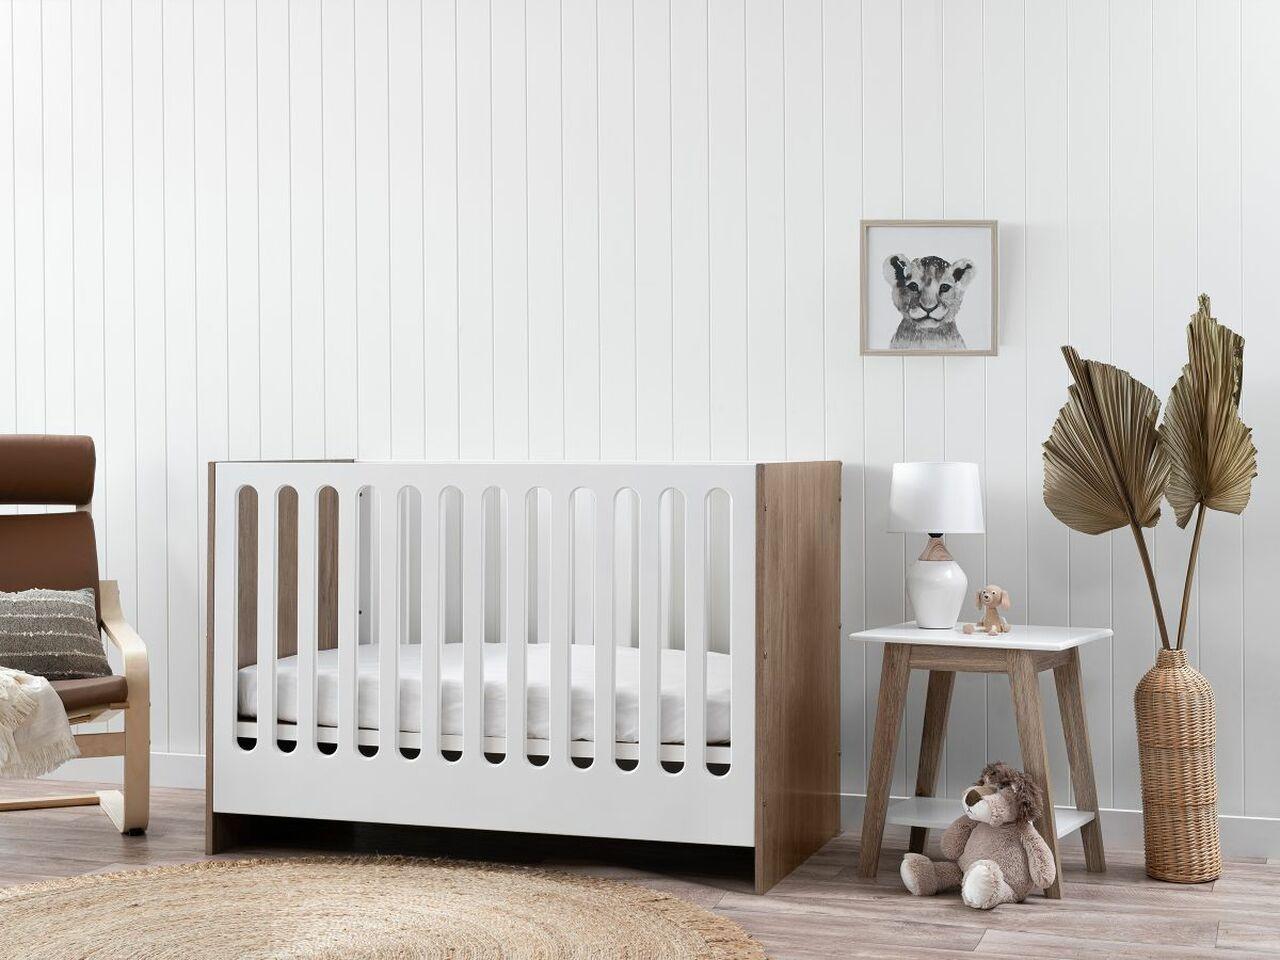 malfi luxe baby cot in baby nursery